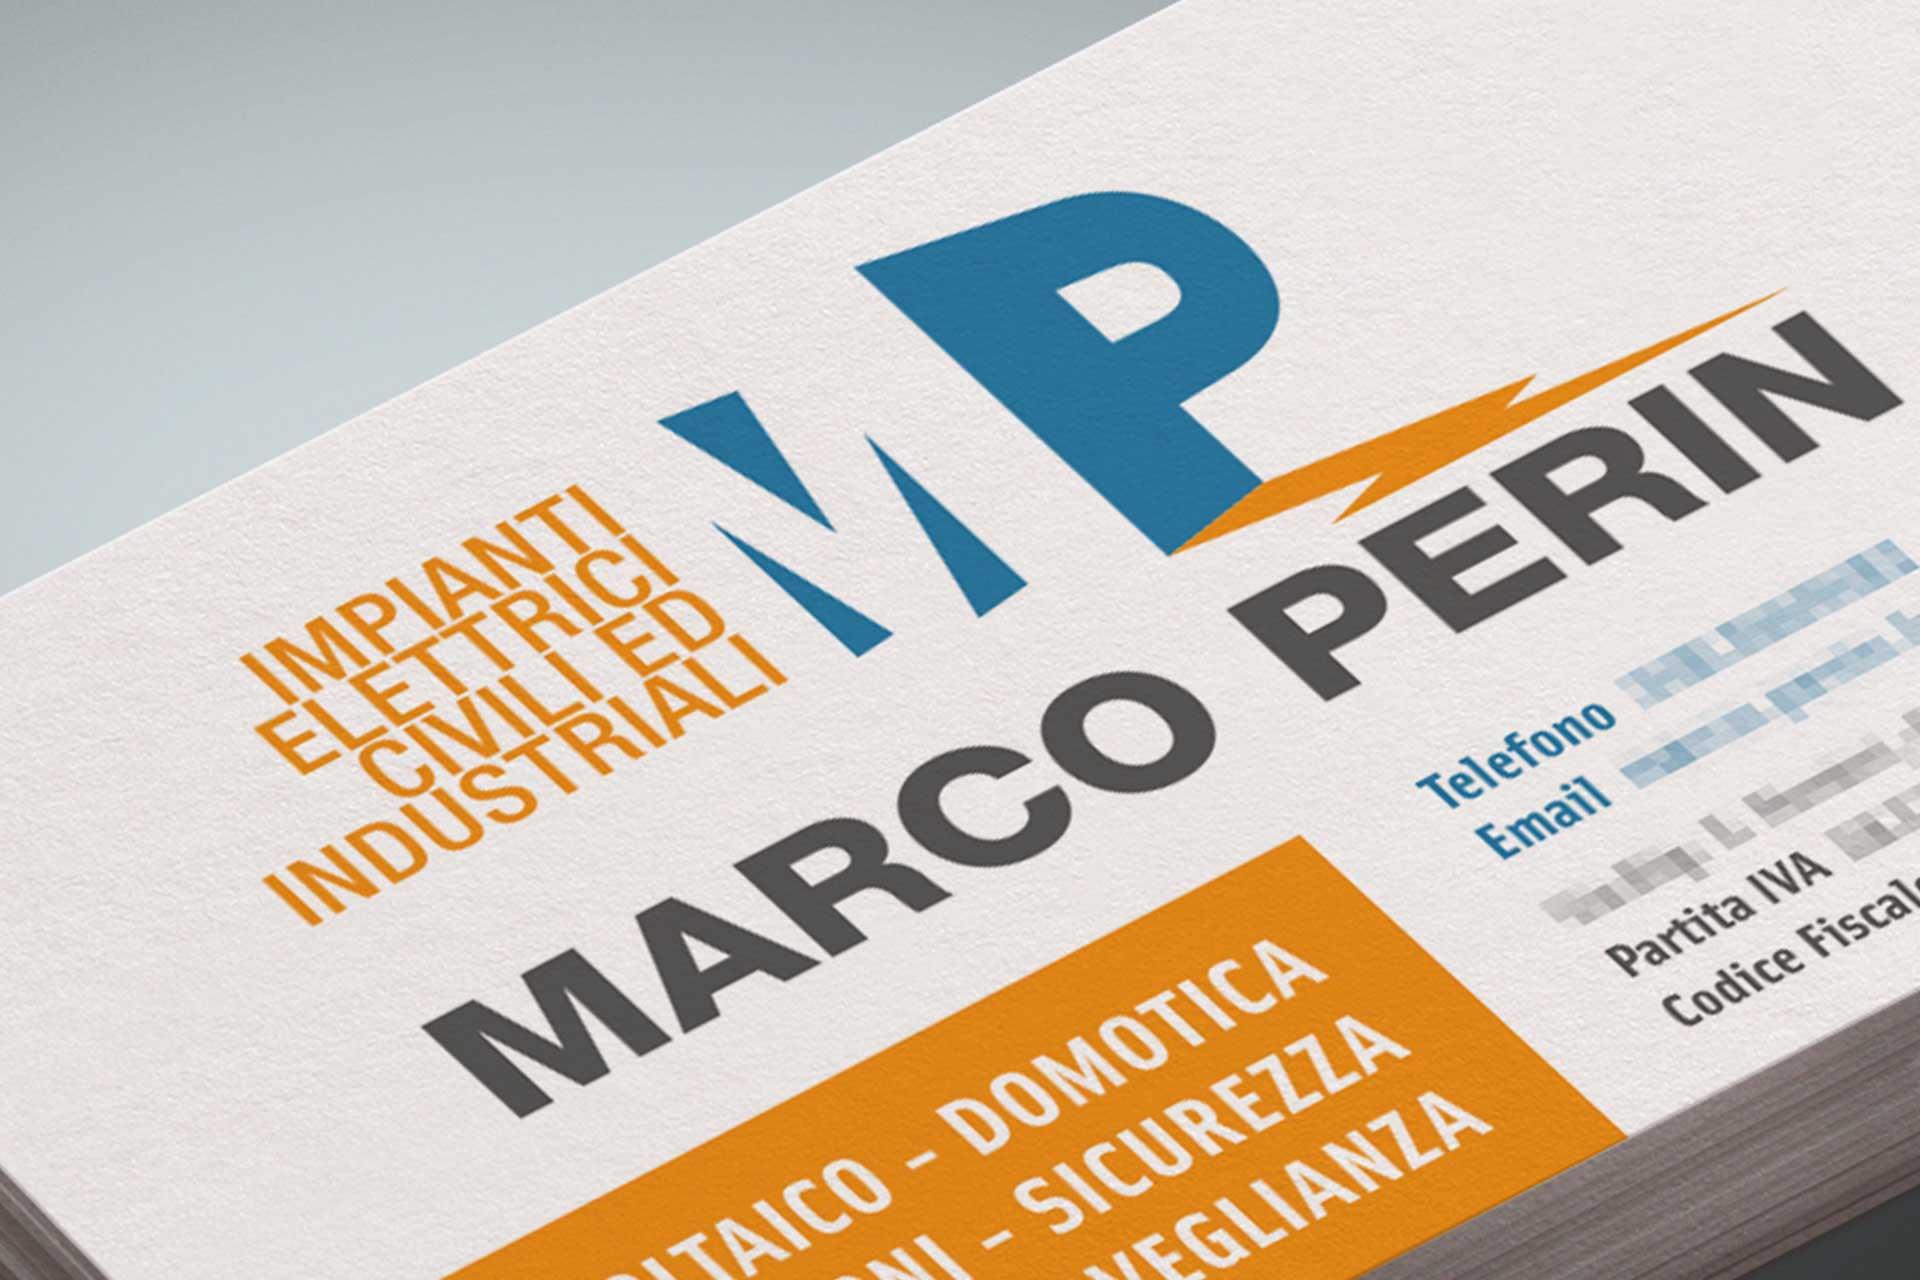 Marco Perin